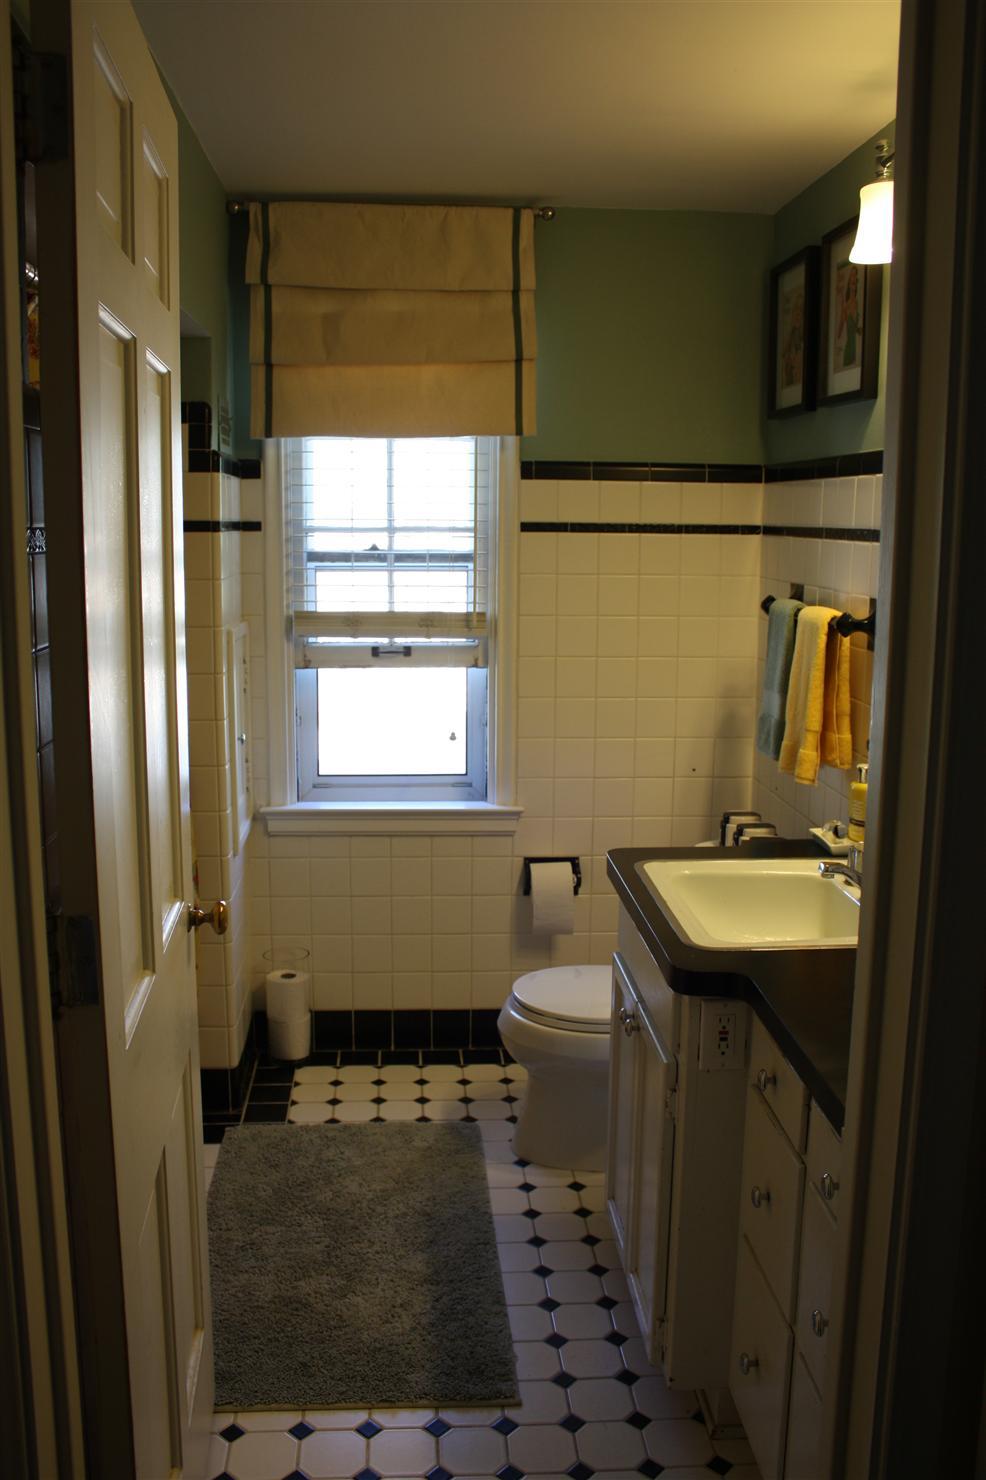 Russet Street Reno: Bathroom refresh